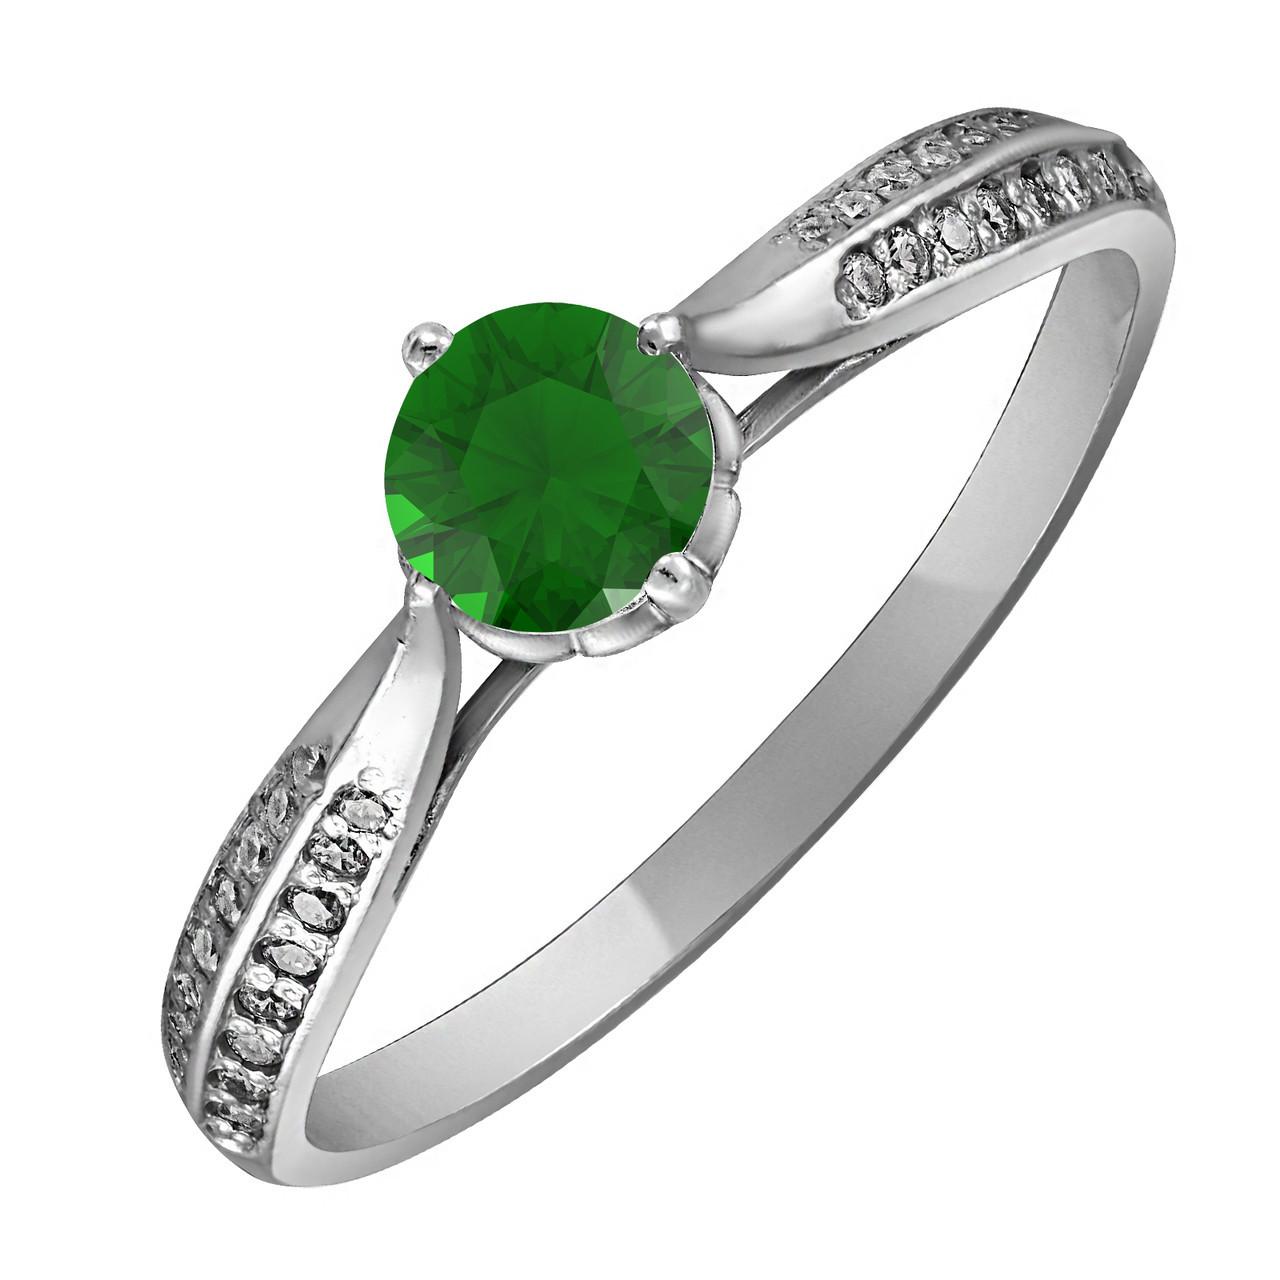 Кольцо из серебра с зелёным кубическим цирконием Twiddle Jewelry 16.0 размер (К007з-16.0)